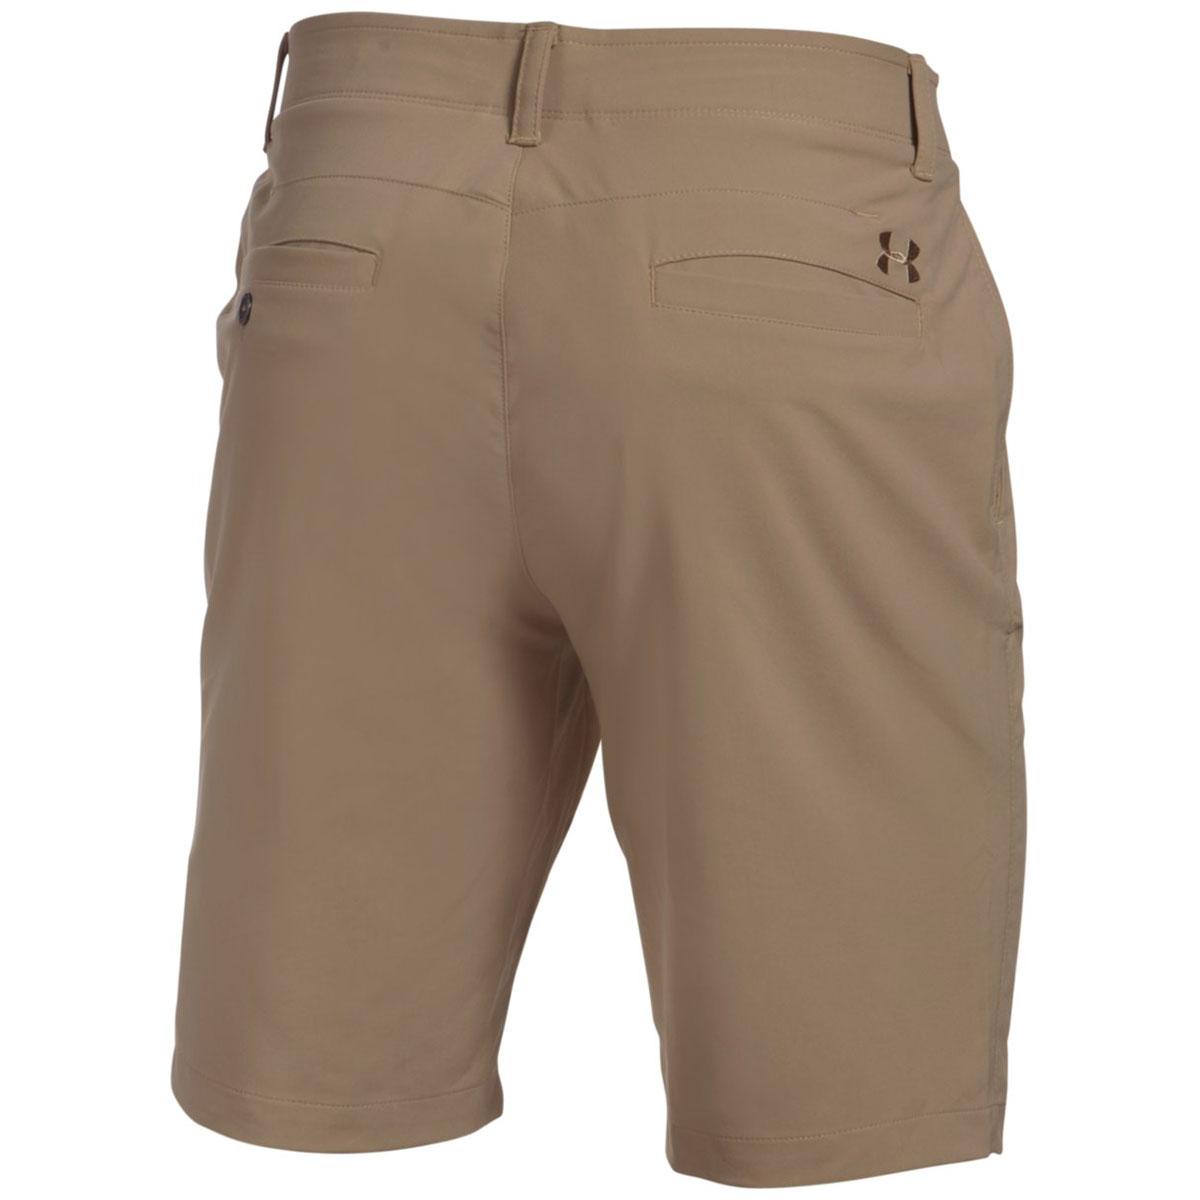 Under-Armour-Mens-UA-Match-Play-Taper-Tech-Performance-Summer-Golf-Shorts thumbnail 11